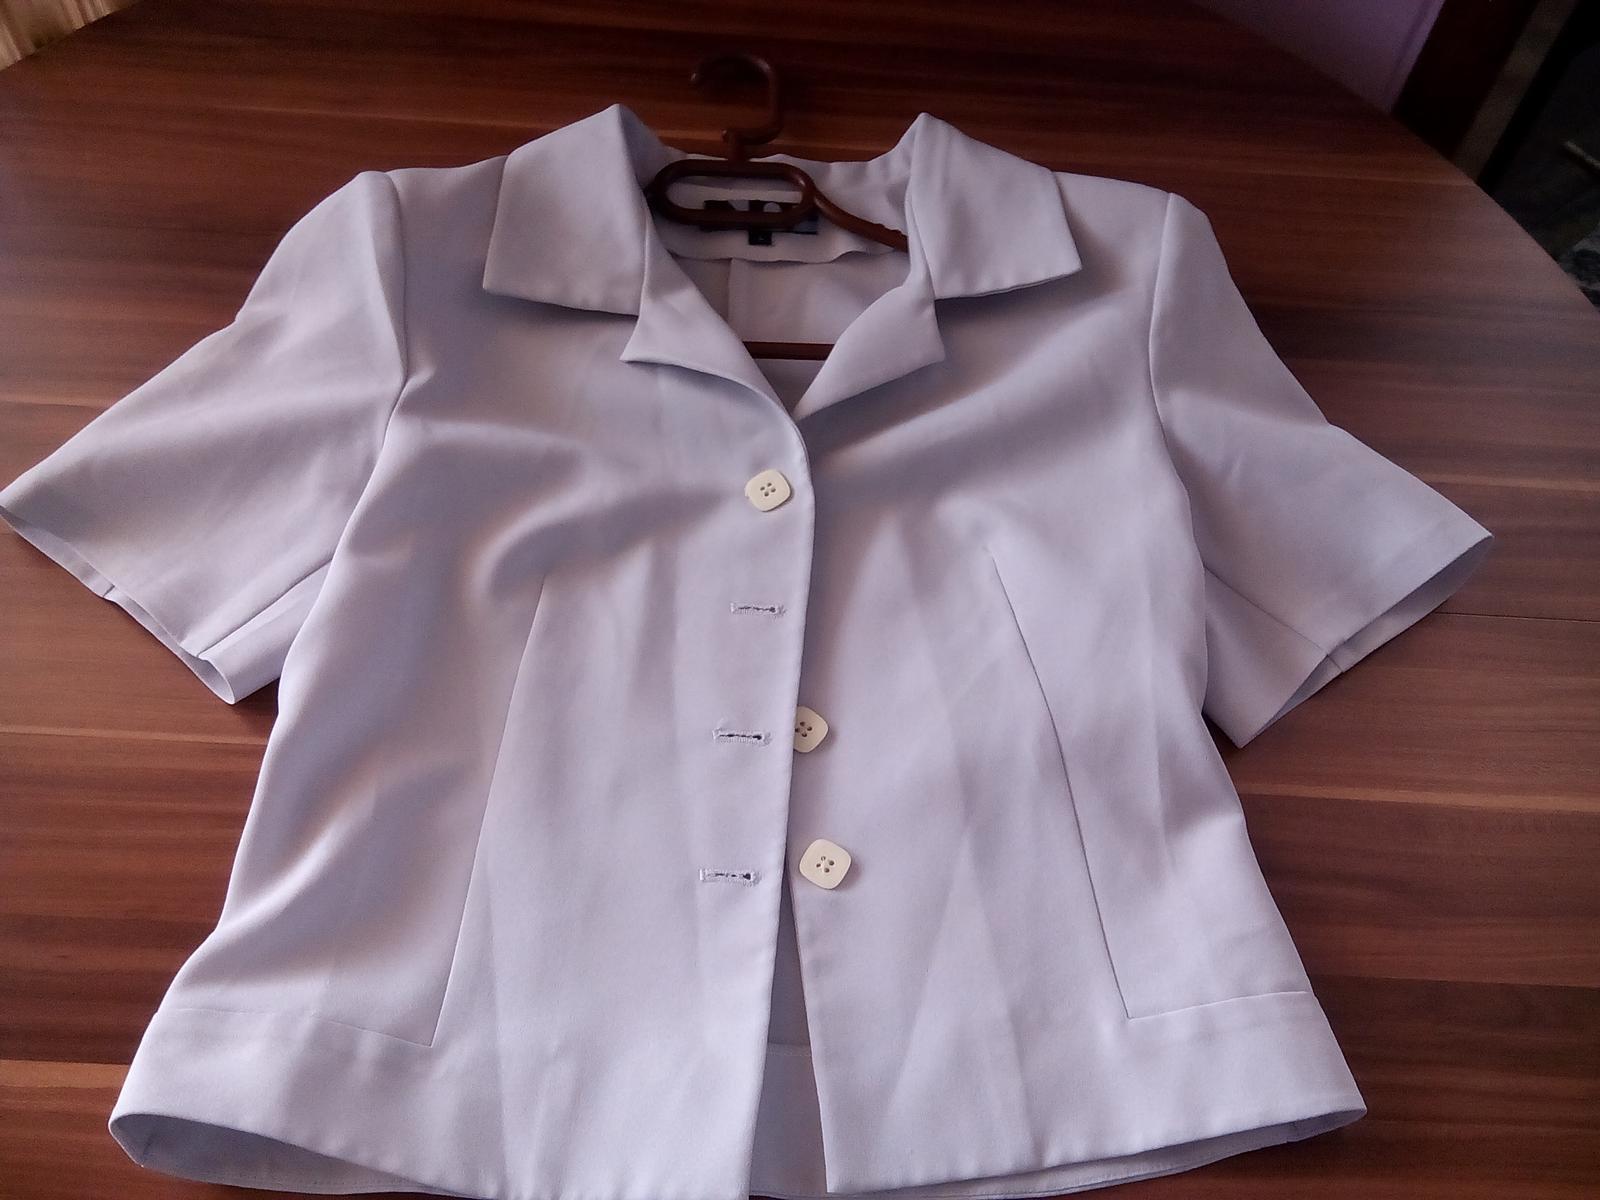 letny kostym - Obrázok č. 1